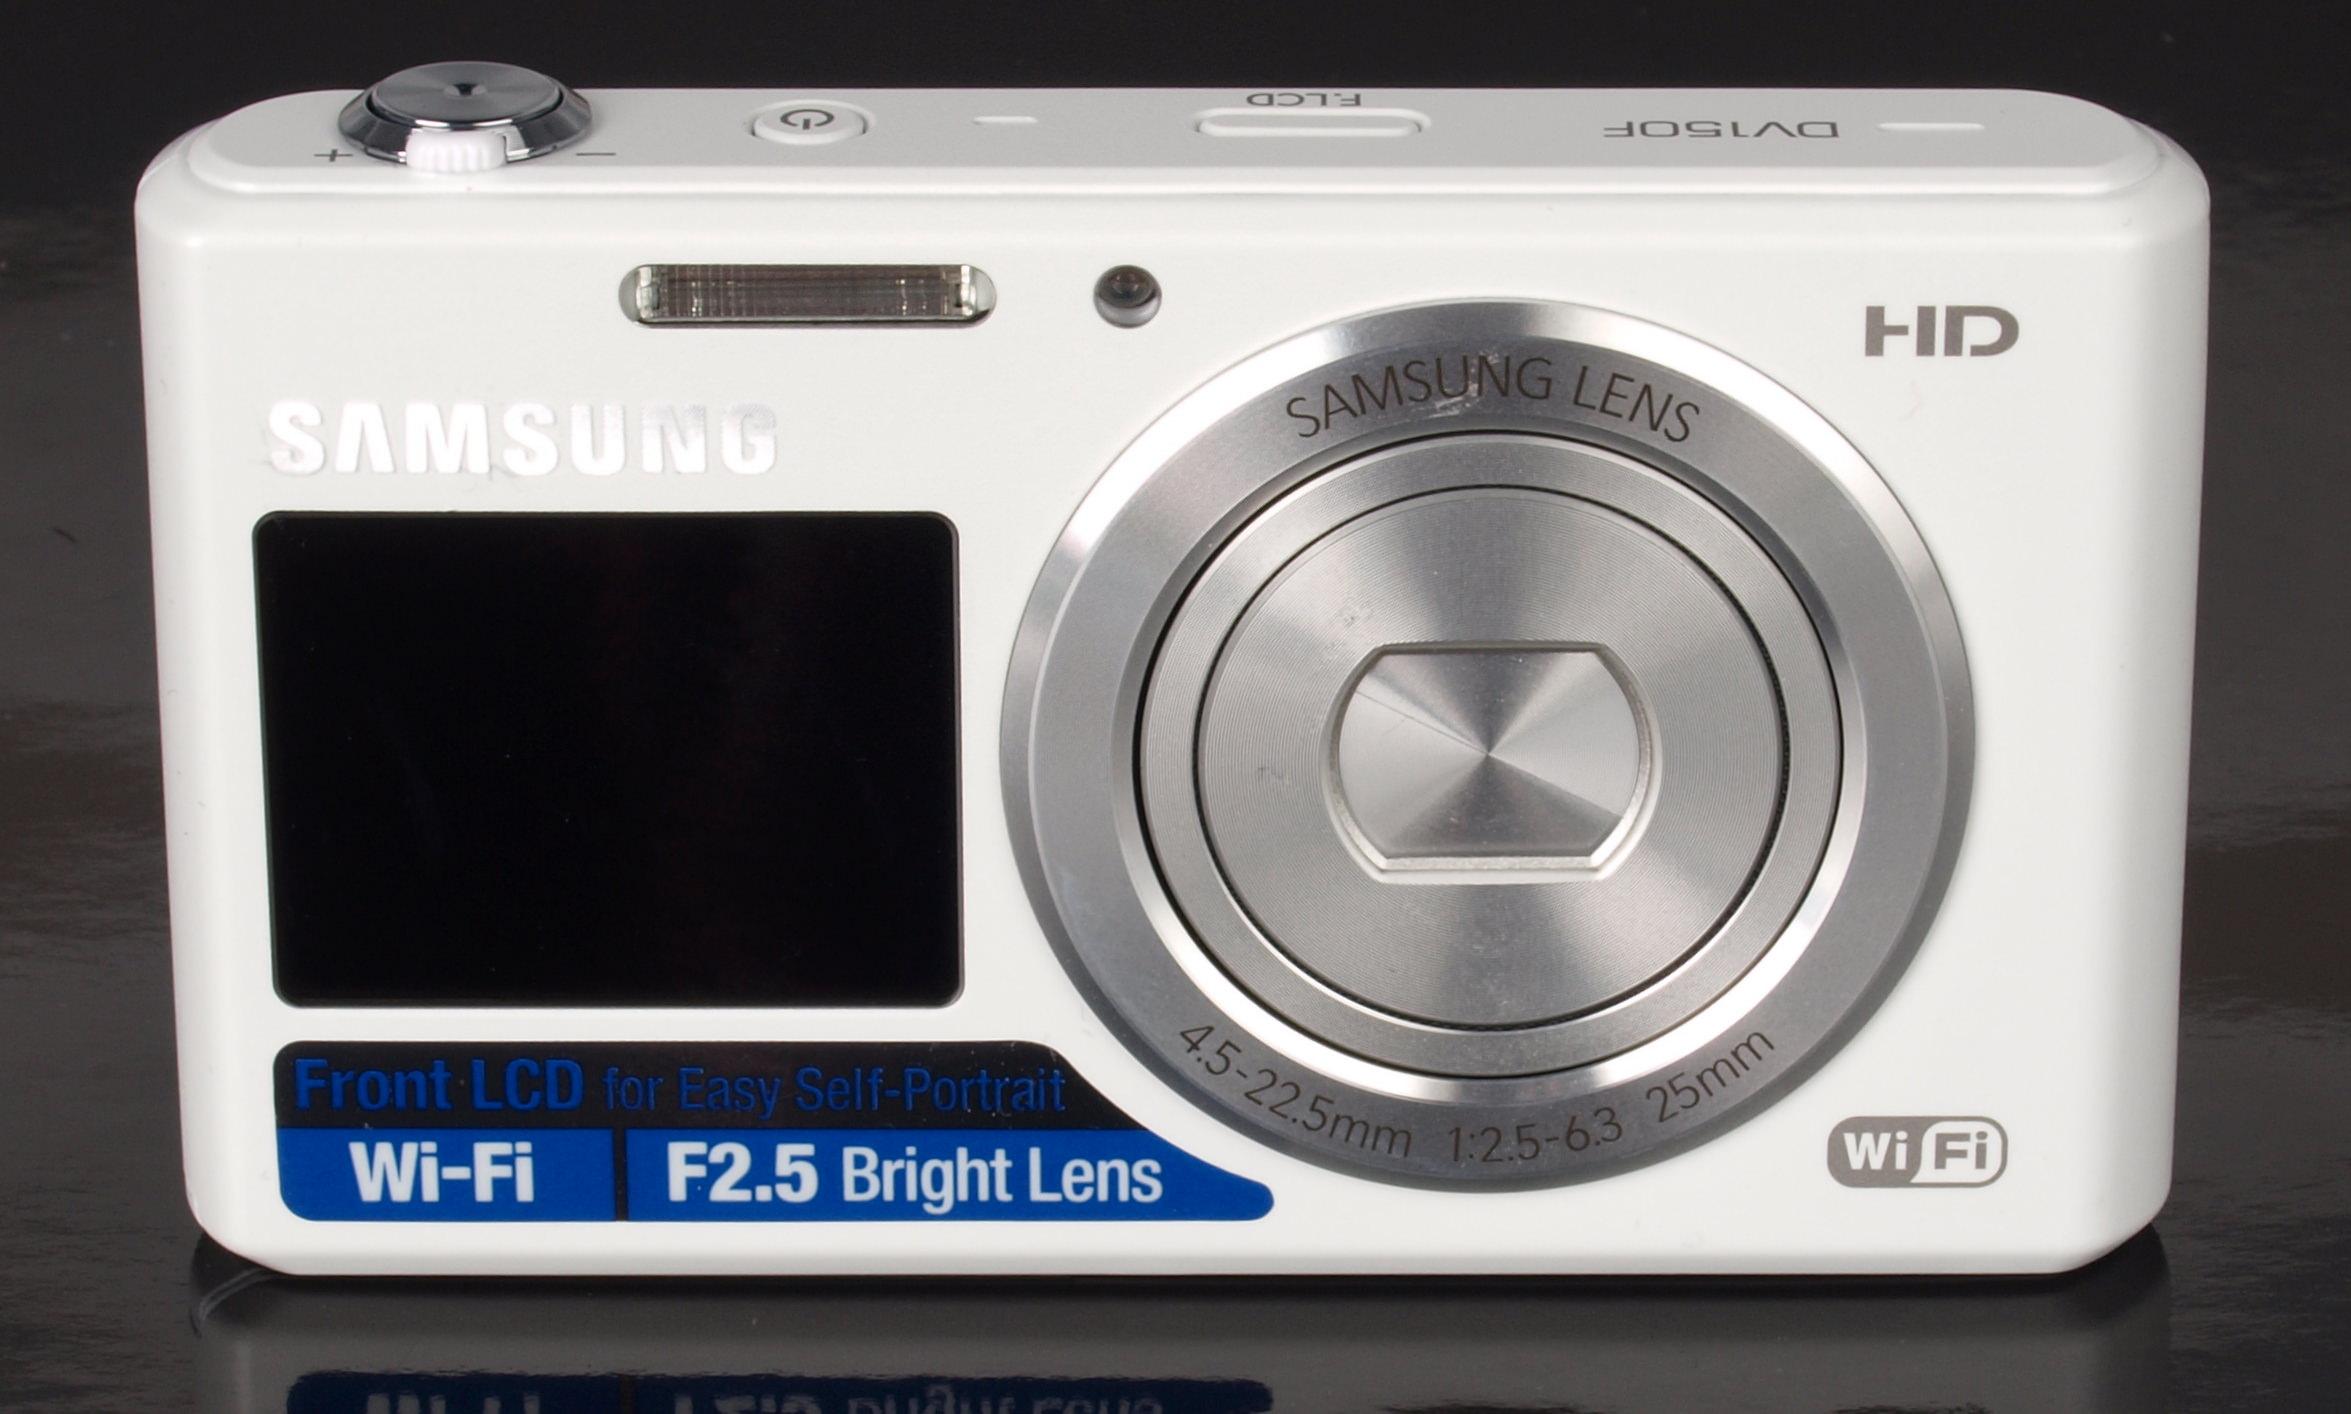 samsung dv150f review rh ephotozine com Samsung Smart Cameras with Wi-Fi Samsung DV150 Camera Purple